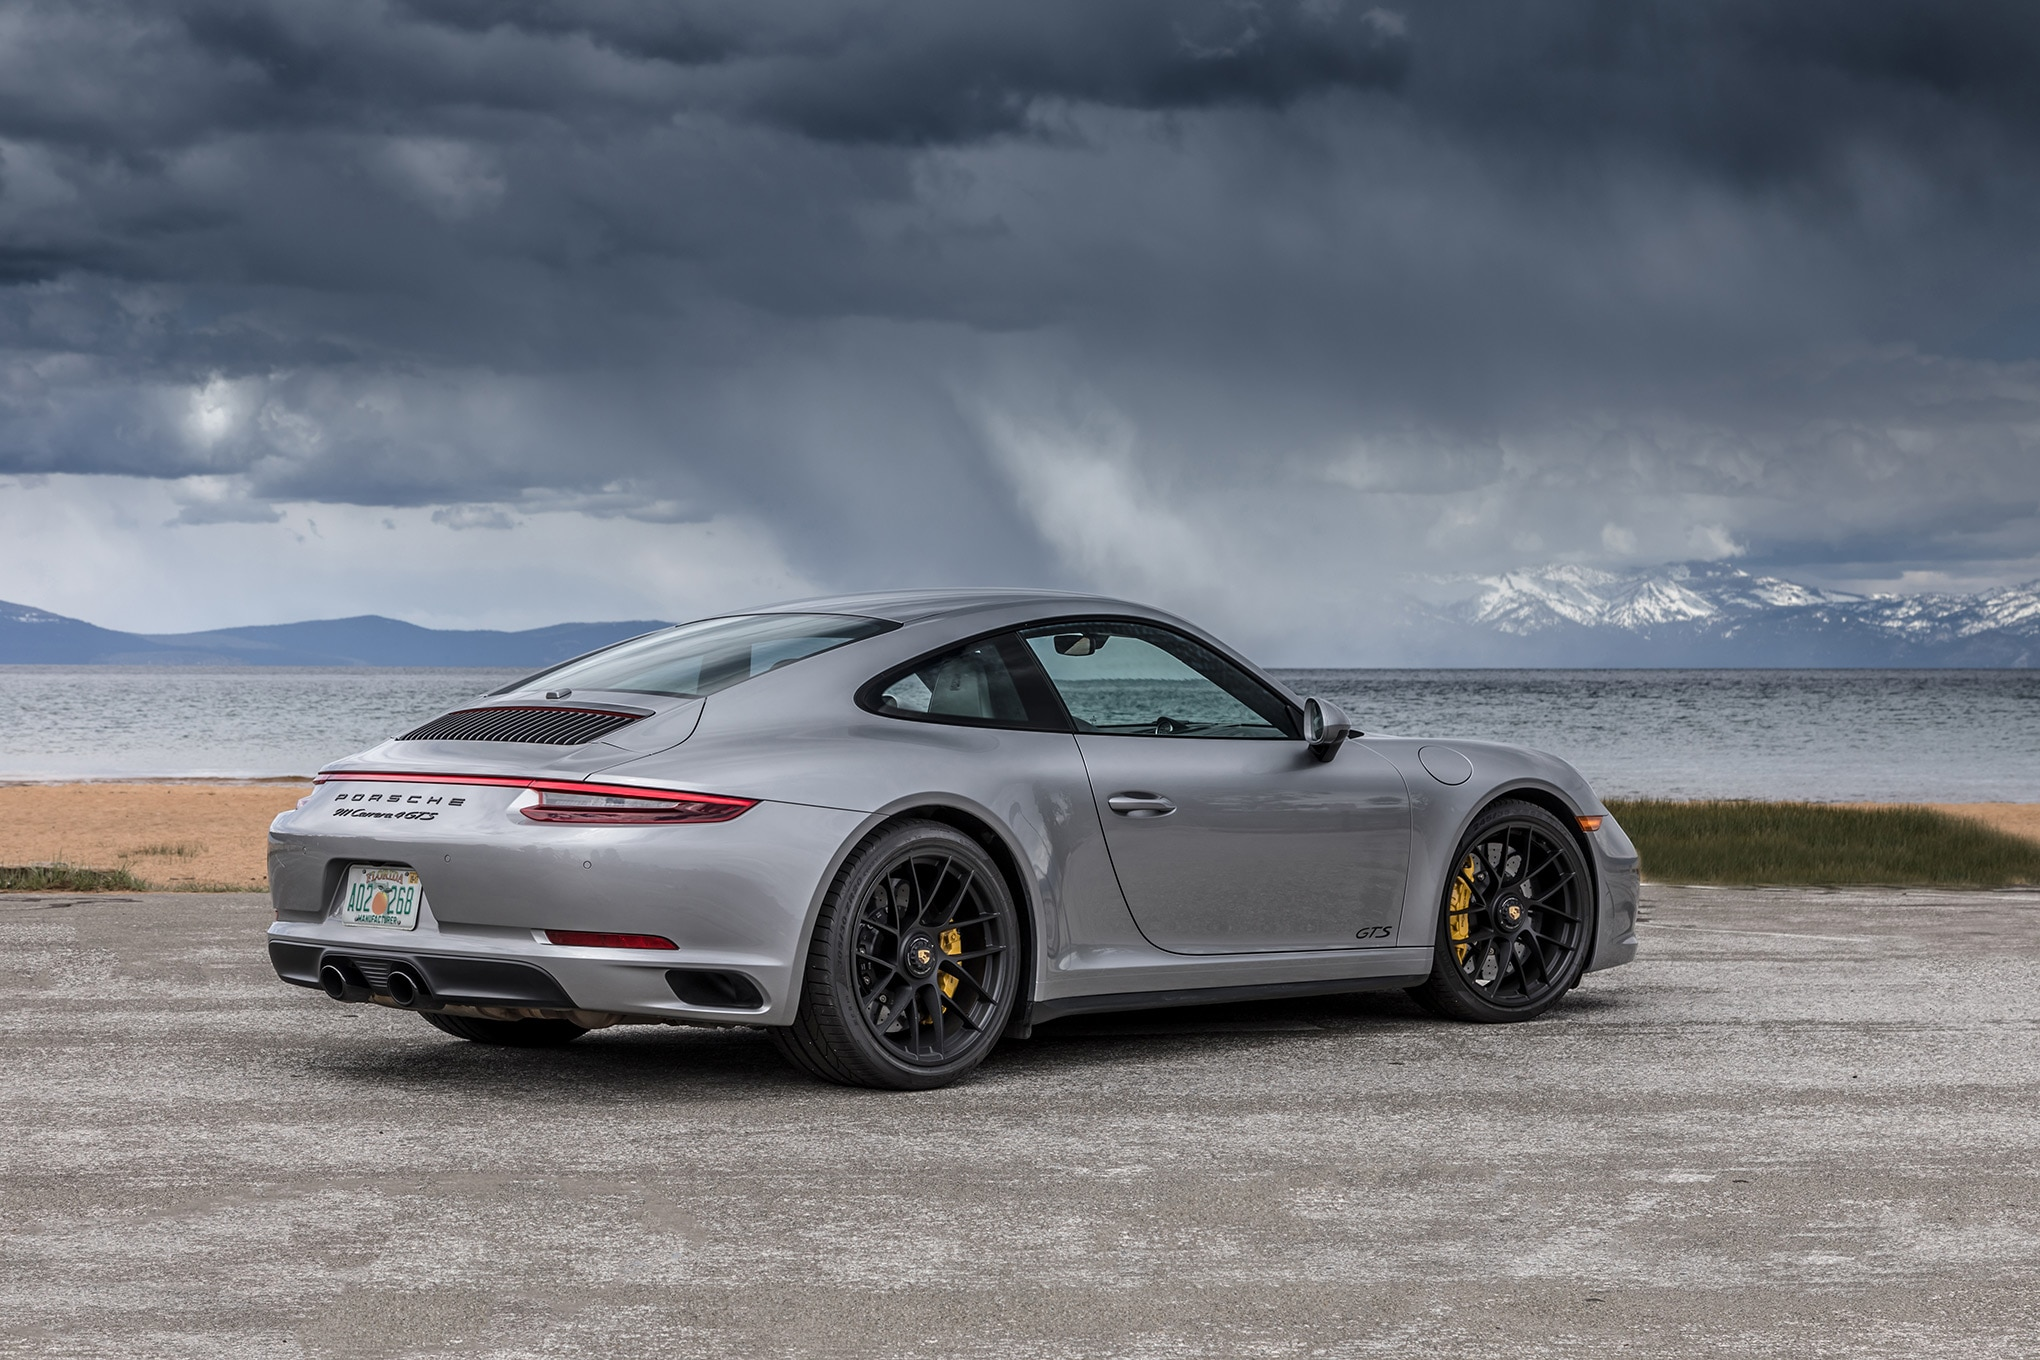 vanquishing mountains in the new 2017 porsche 911 carrera 4 gts rh automobilemag com